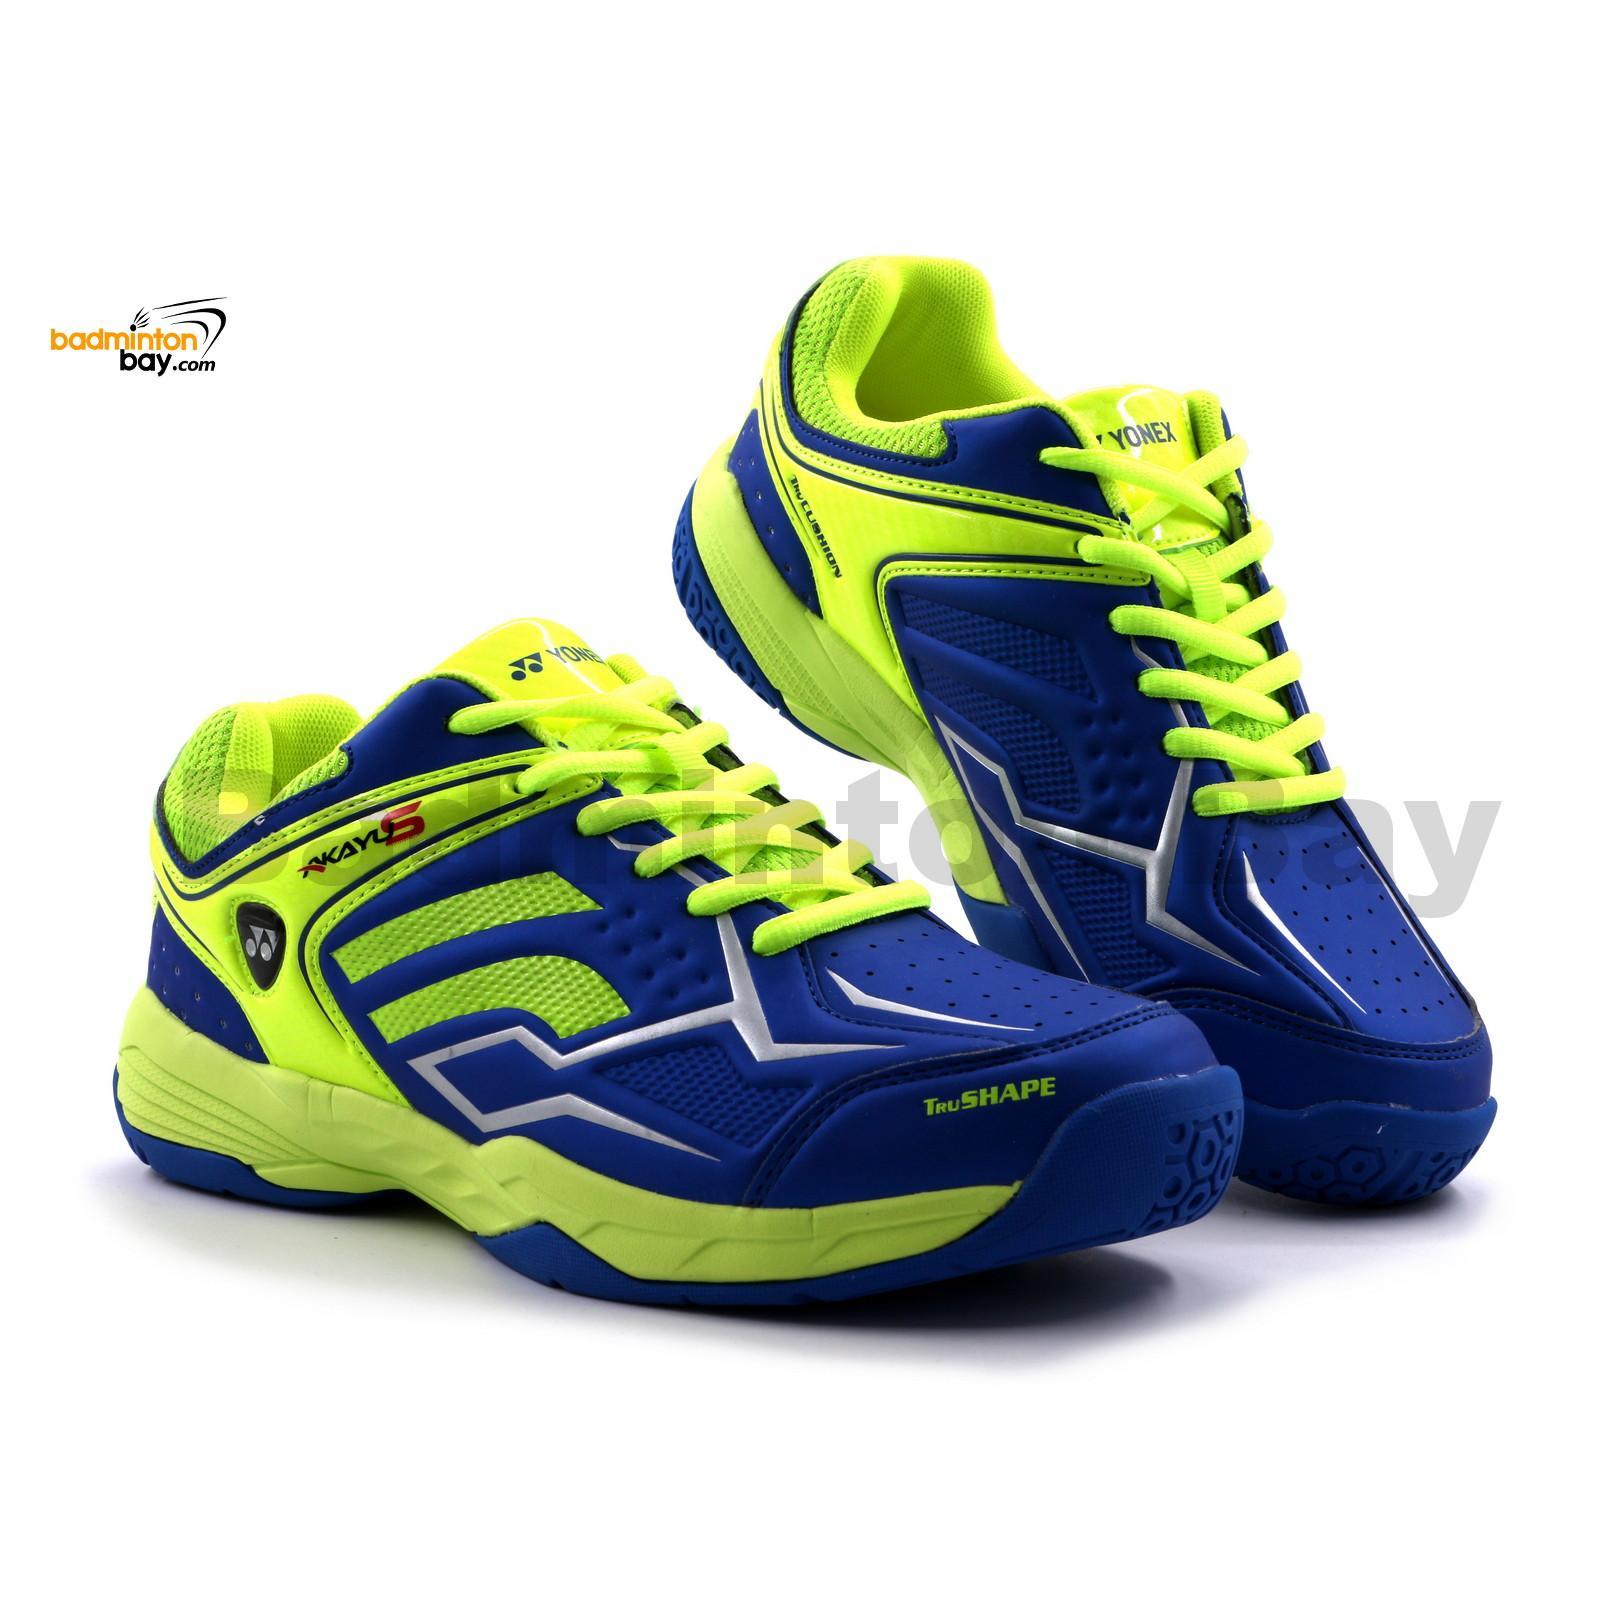 Yonex Akayu S Blue Neon Lime Green Badminton Shoes In Court With Tru Cushion Technology